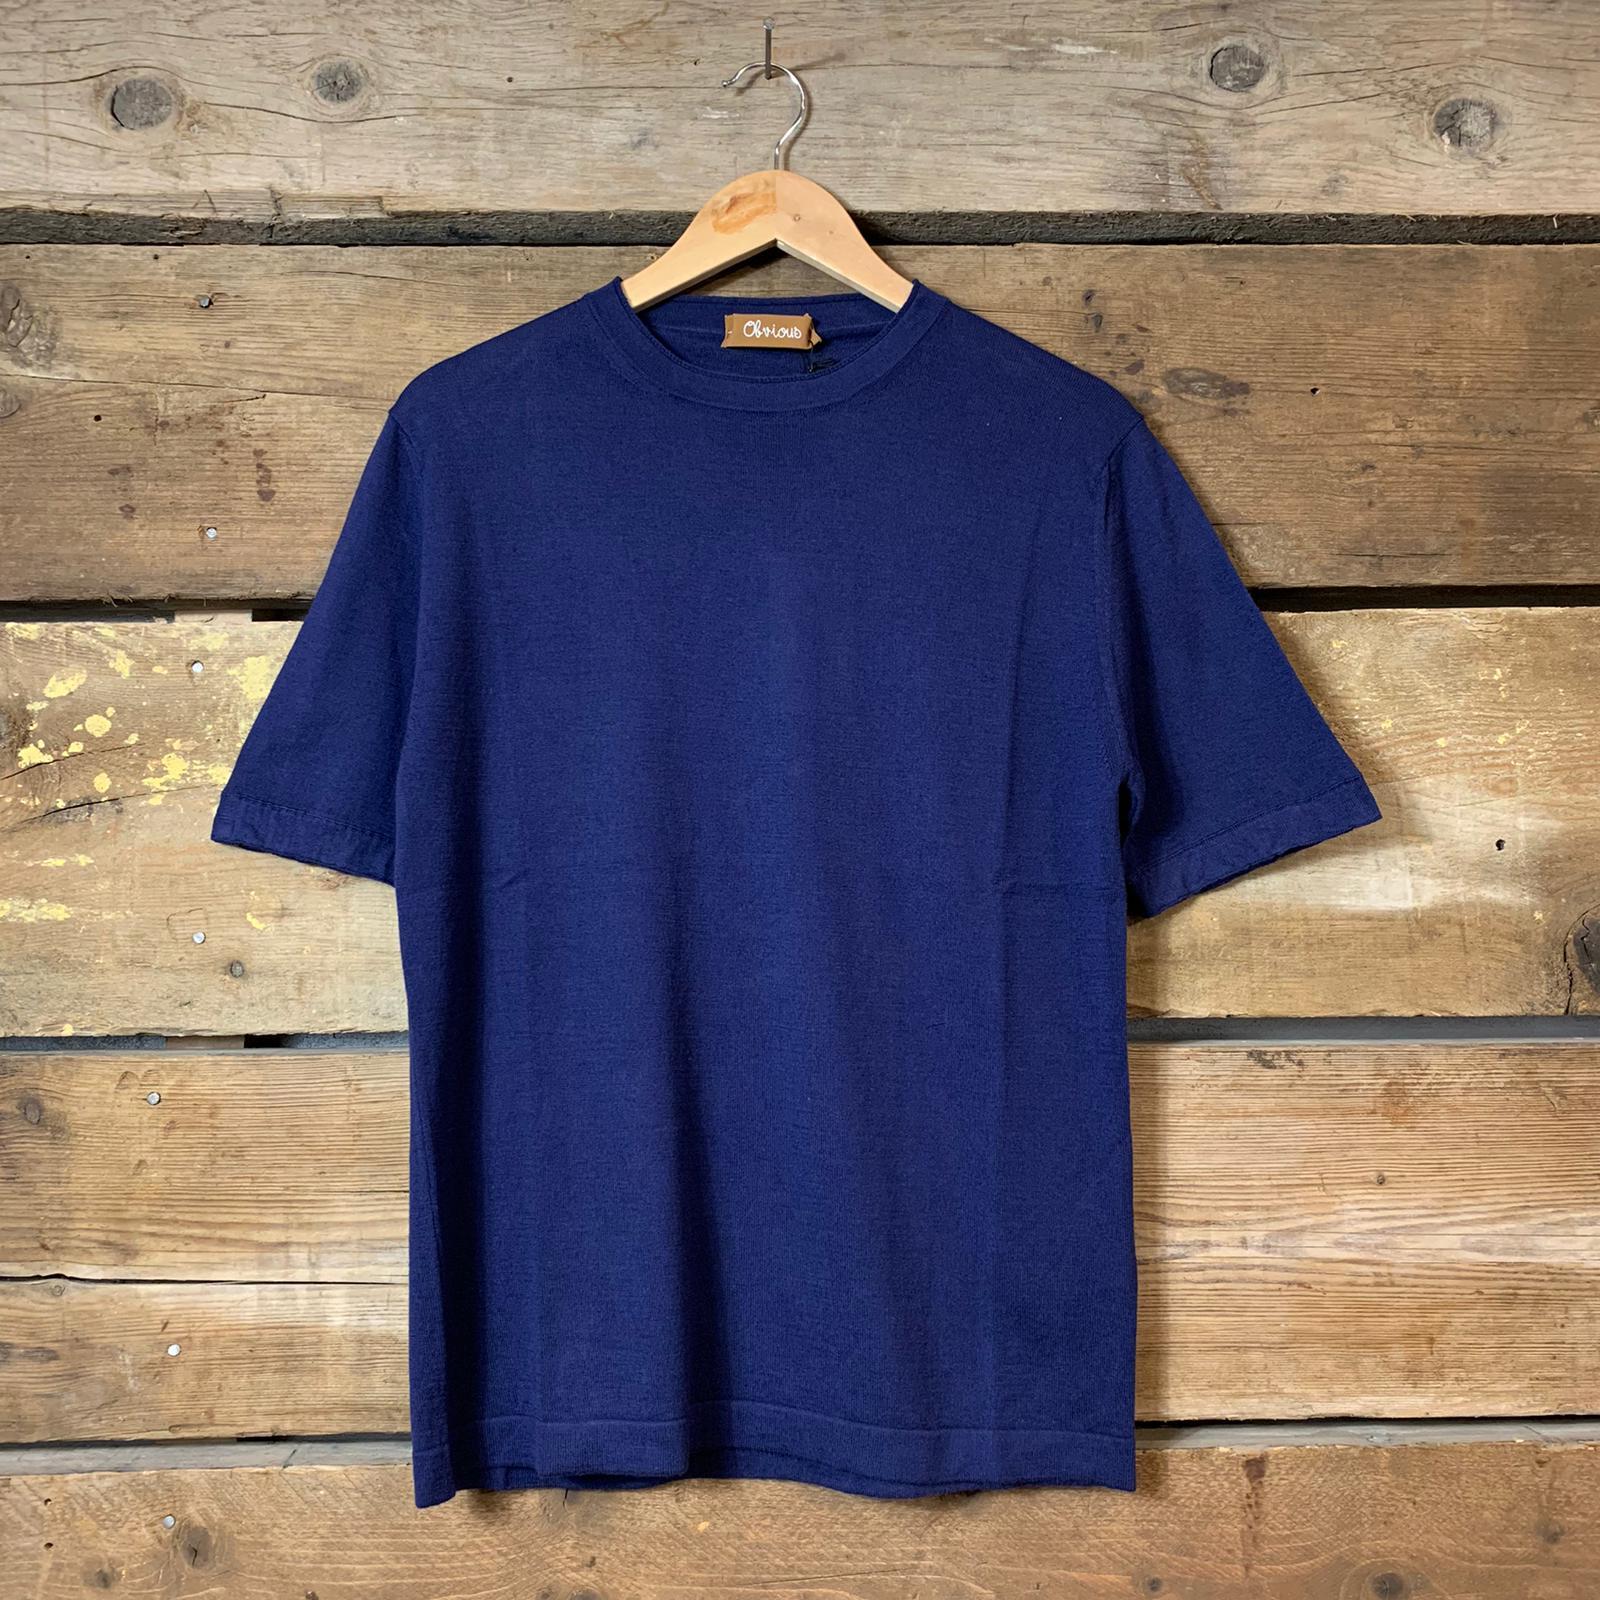 Maglia Obvious Basic a Maniche Corte in Maglia 100% Cotone Blu